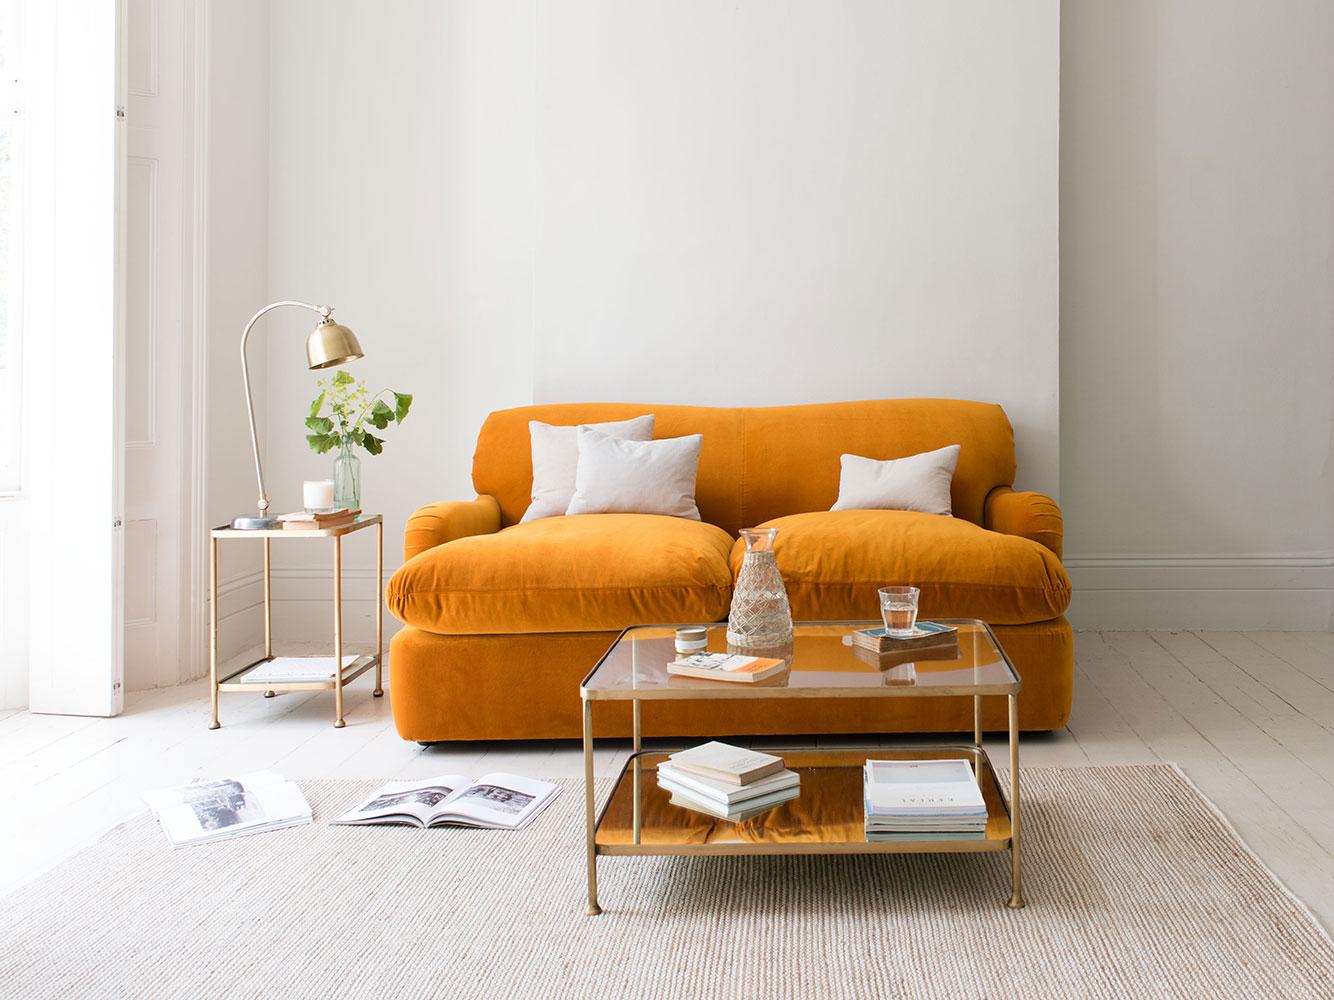 Canapea portocalie cu masa aurie cu blaturi din sticla